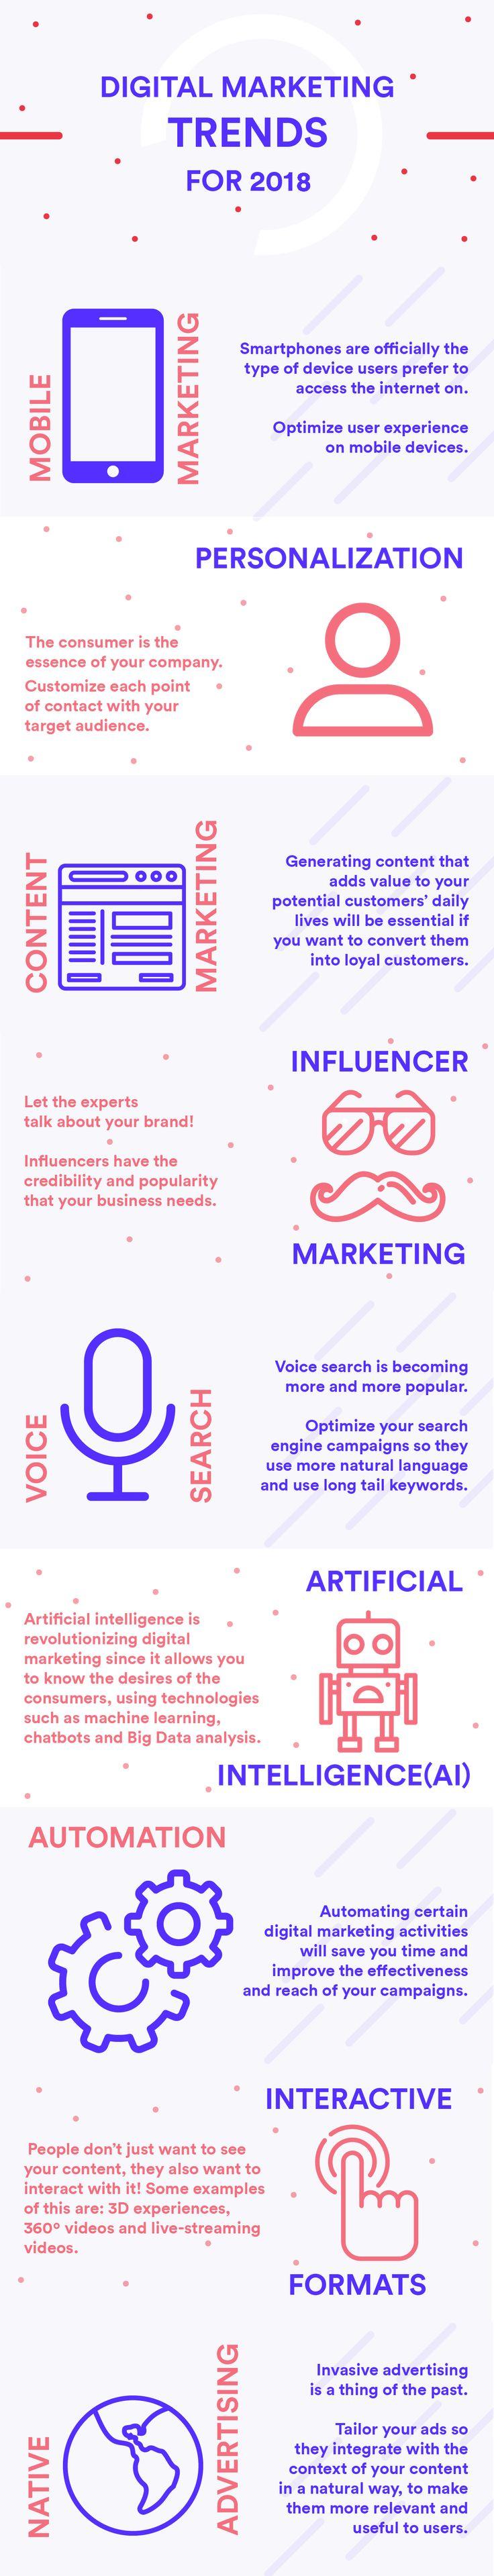 Digital-marketing-trends-2018-1.png